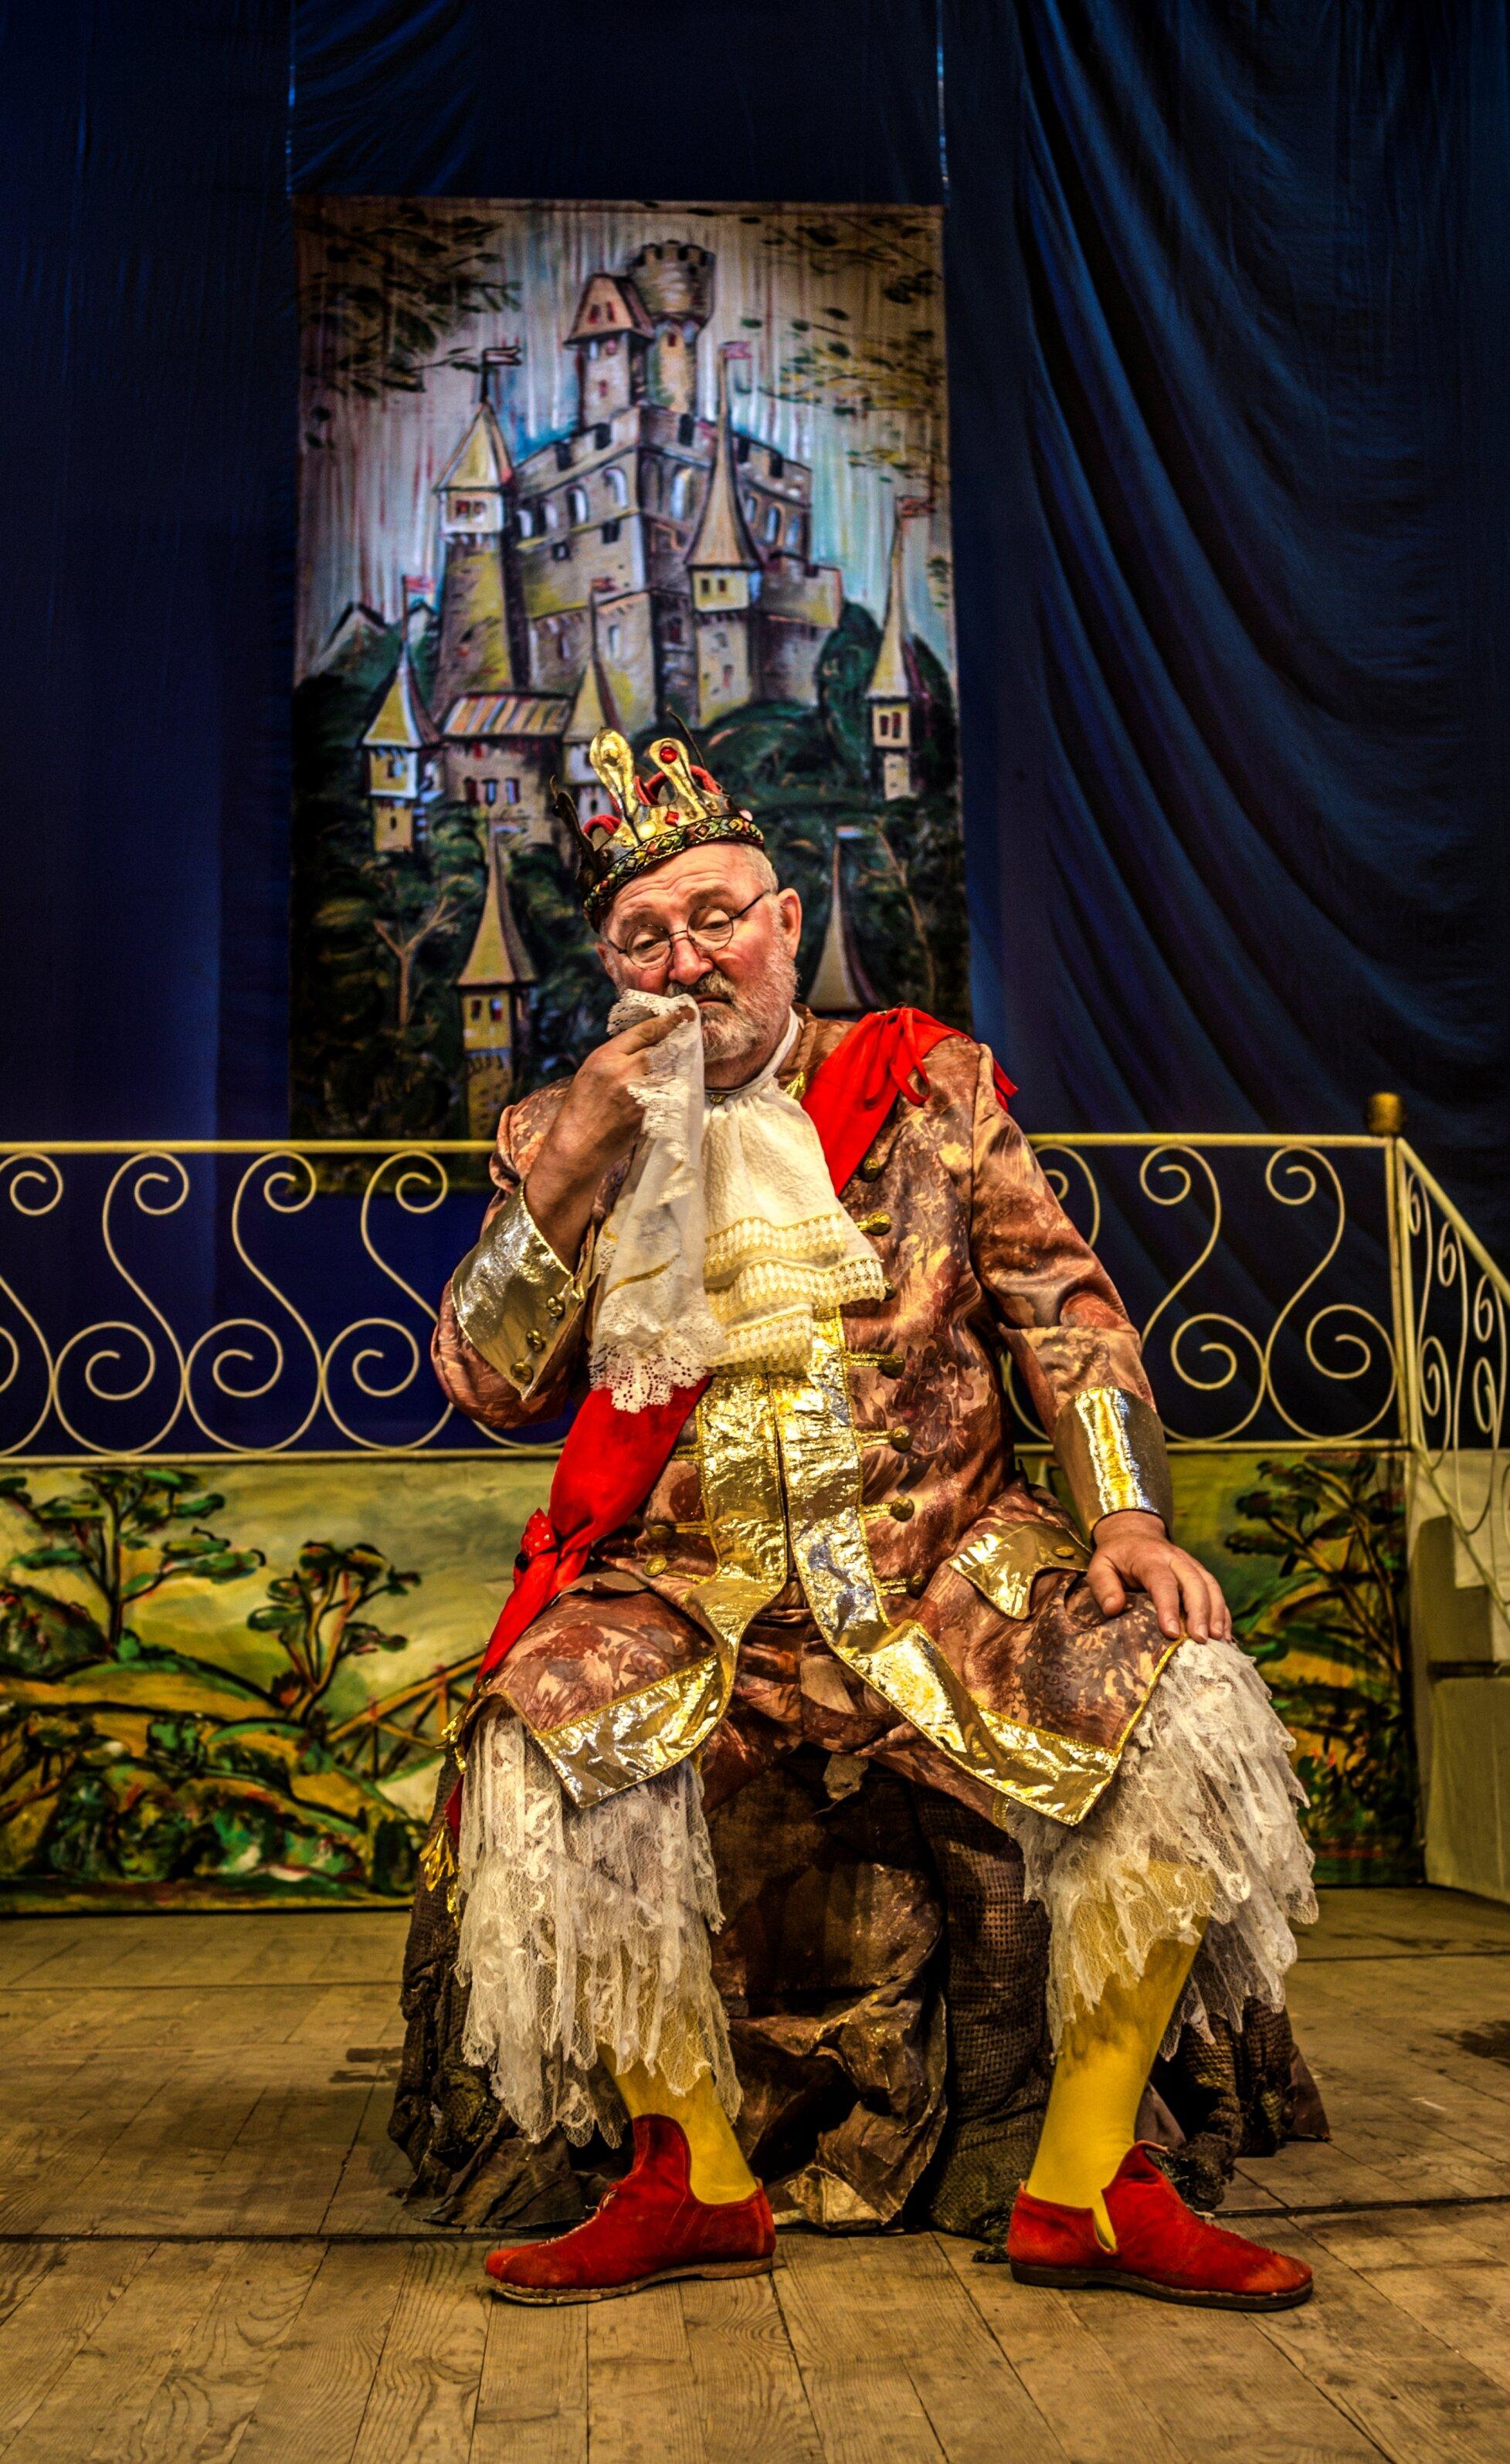 http://www.blagoevgradtheater.eu/images/_Snimki_ot_Teatyra/_igp0298.jpg